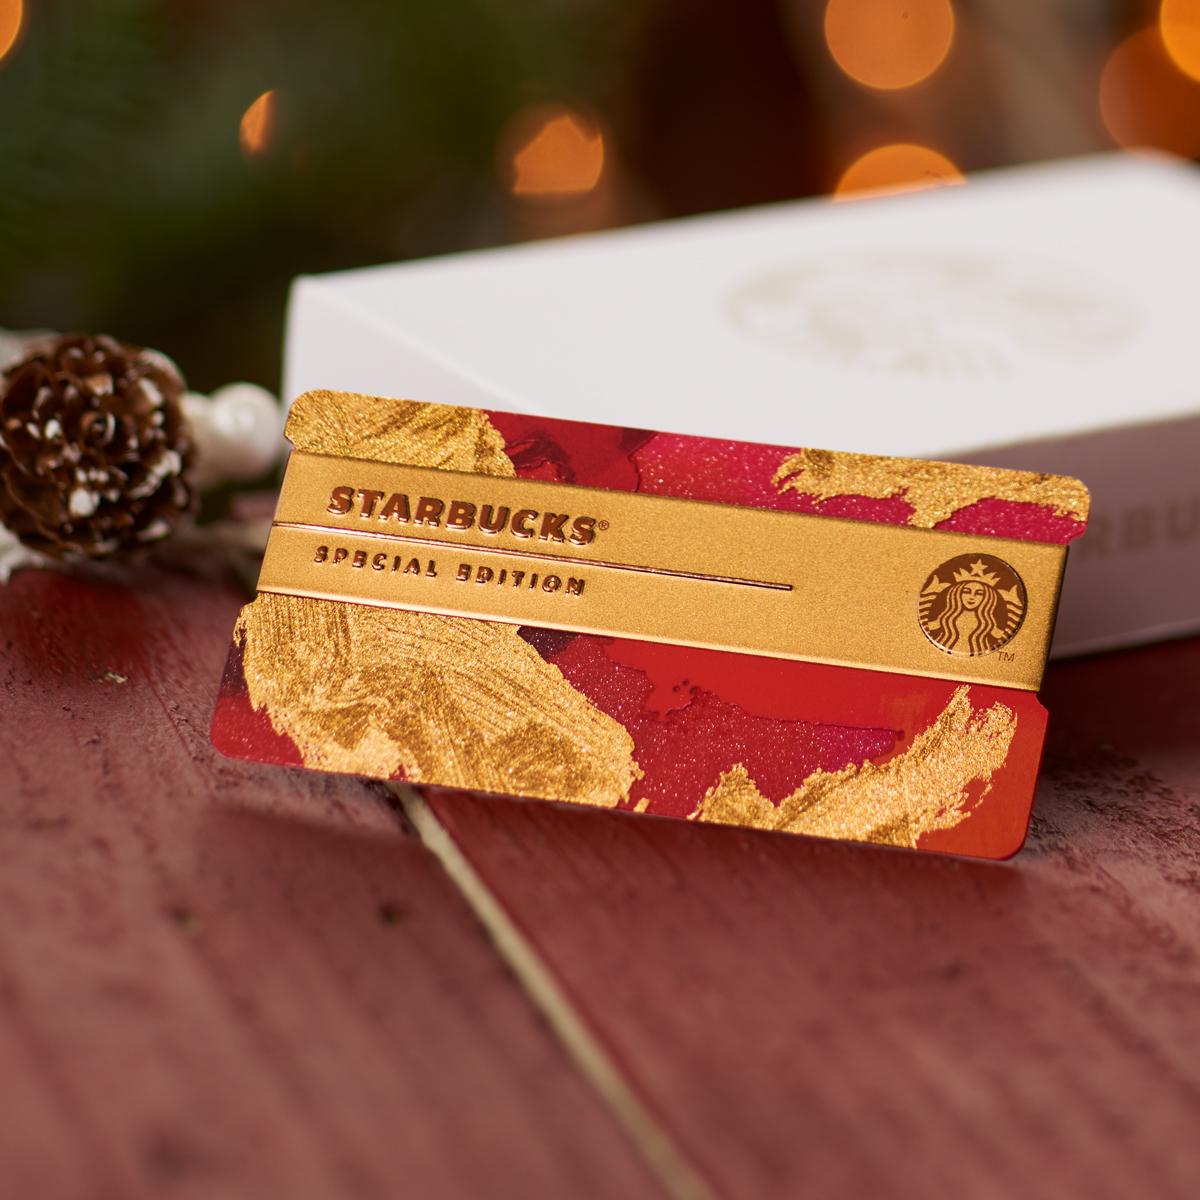 My Starbucks会員限定 スターバックス カード ホリデー スペシャルエディション プレゼント